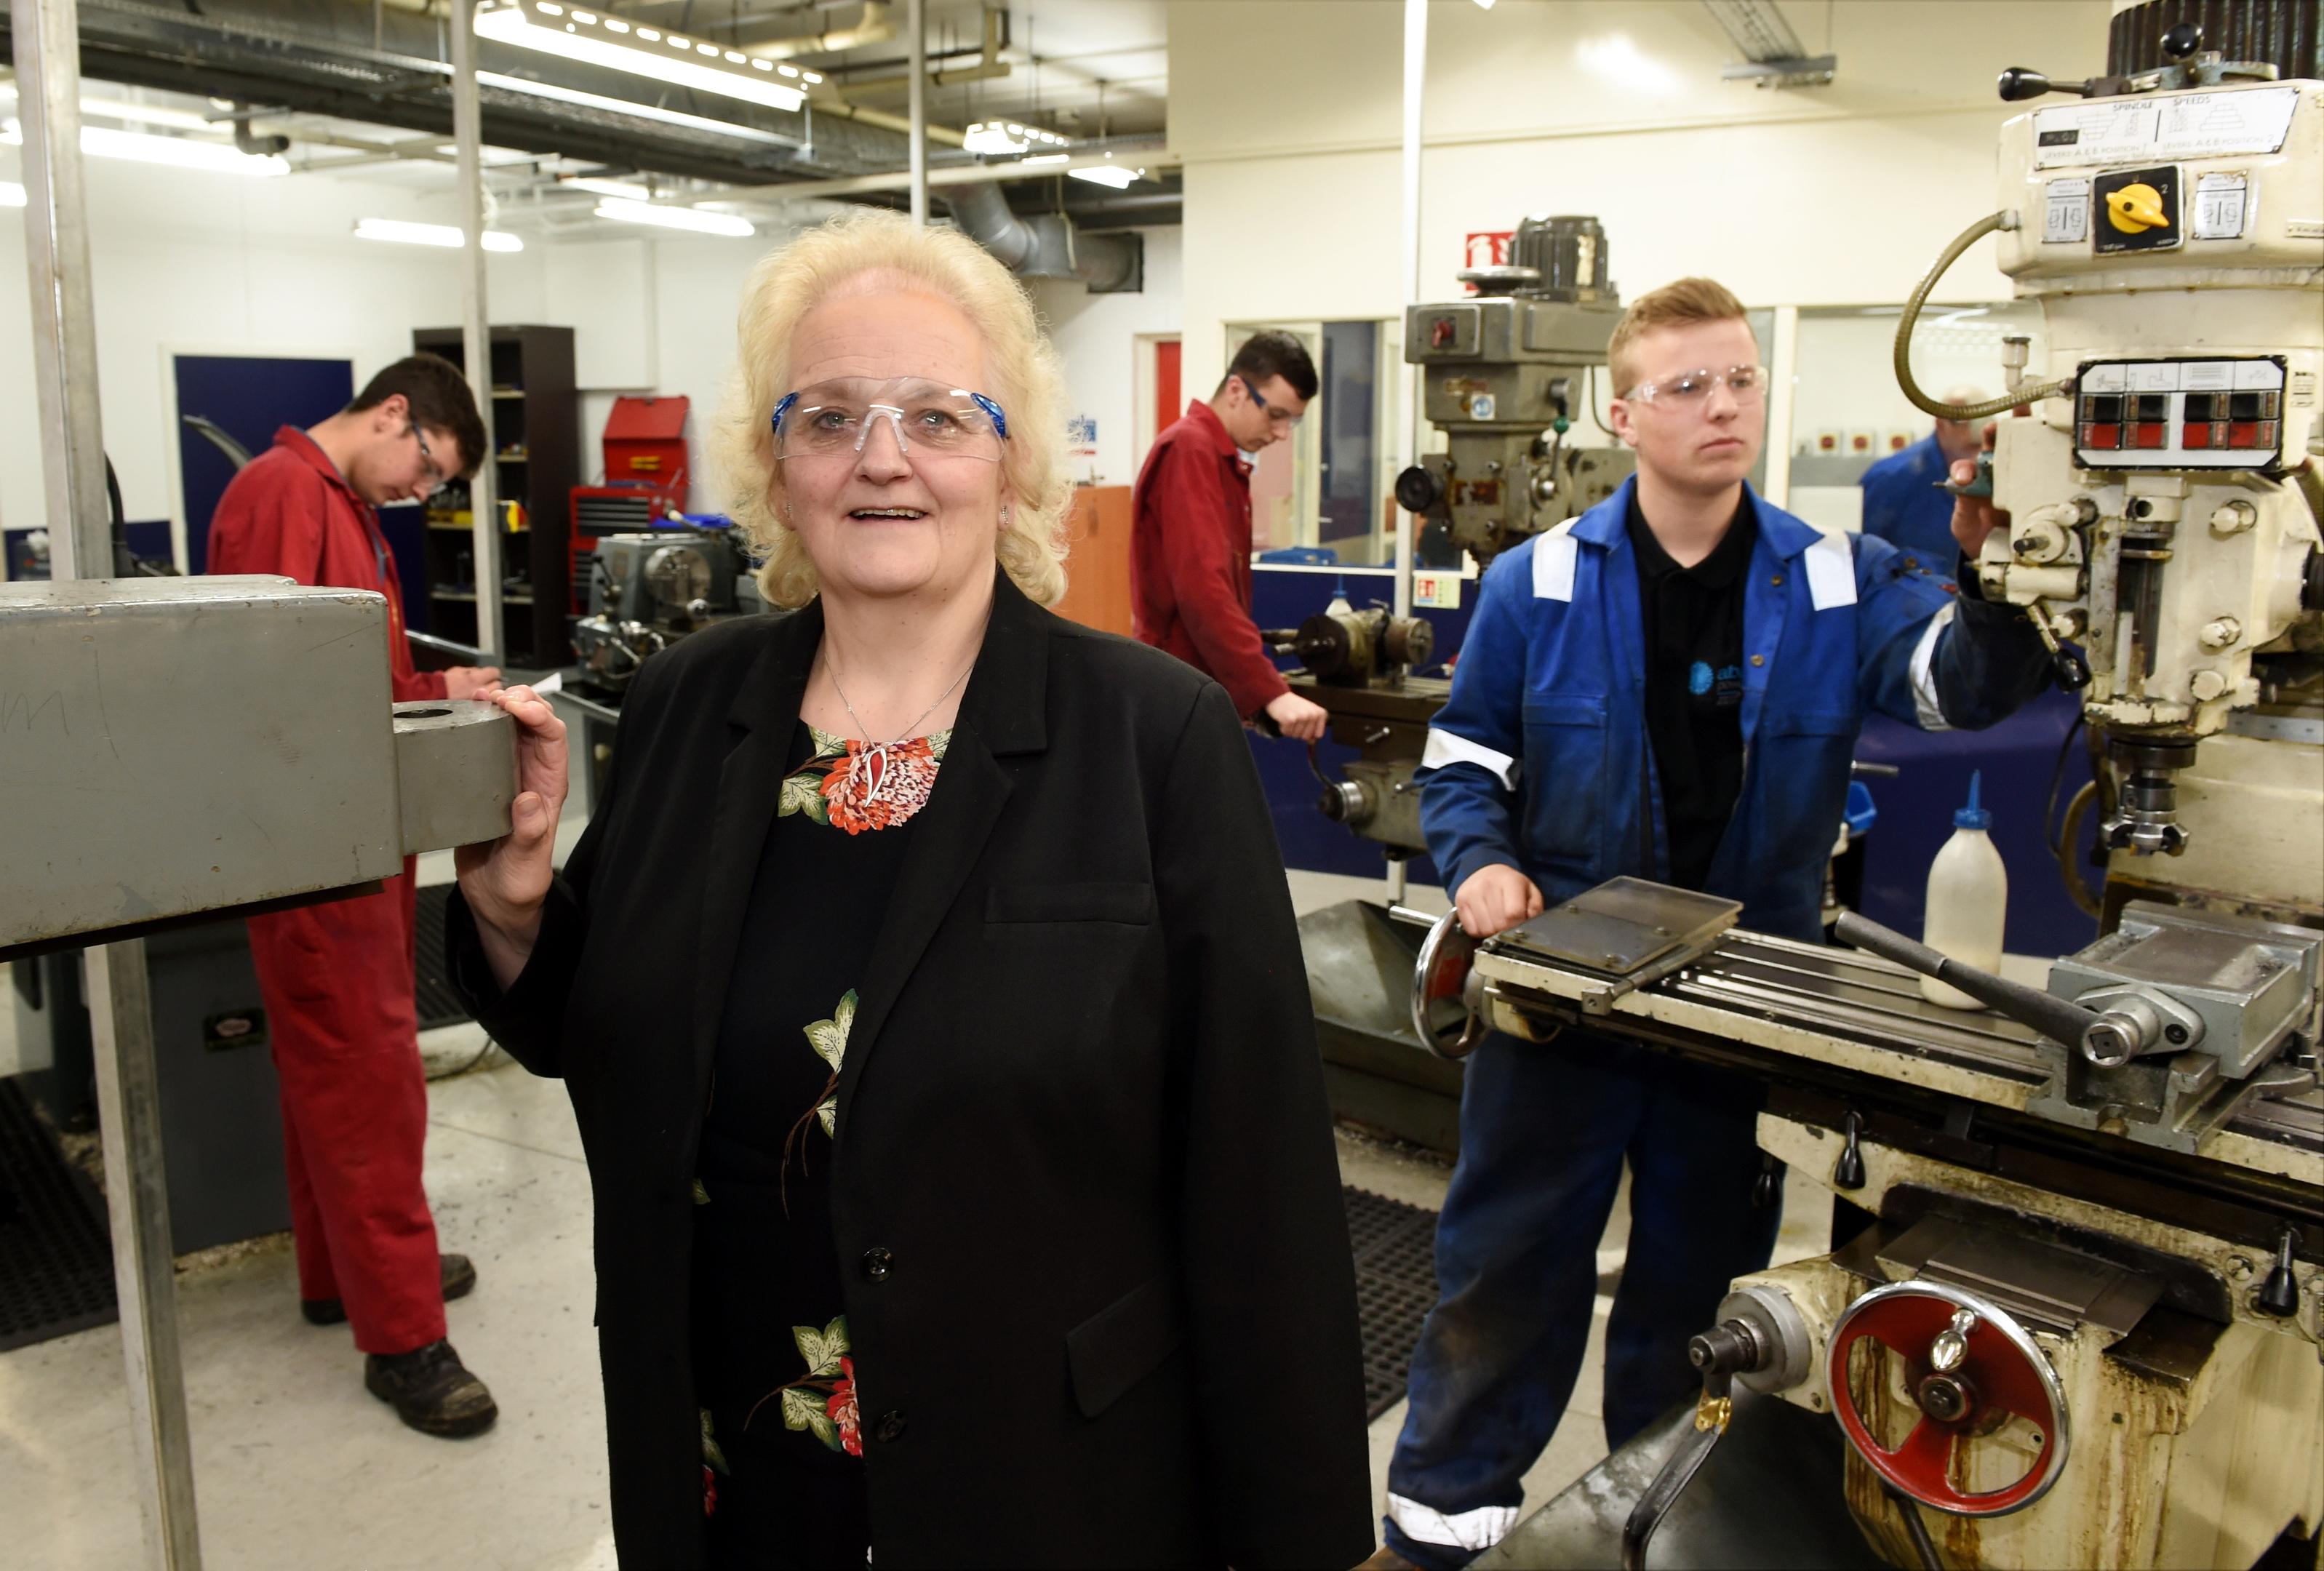 Devastation as ITCA apprentice training centre goes into liquidation